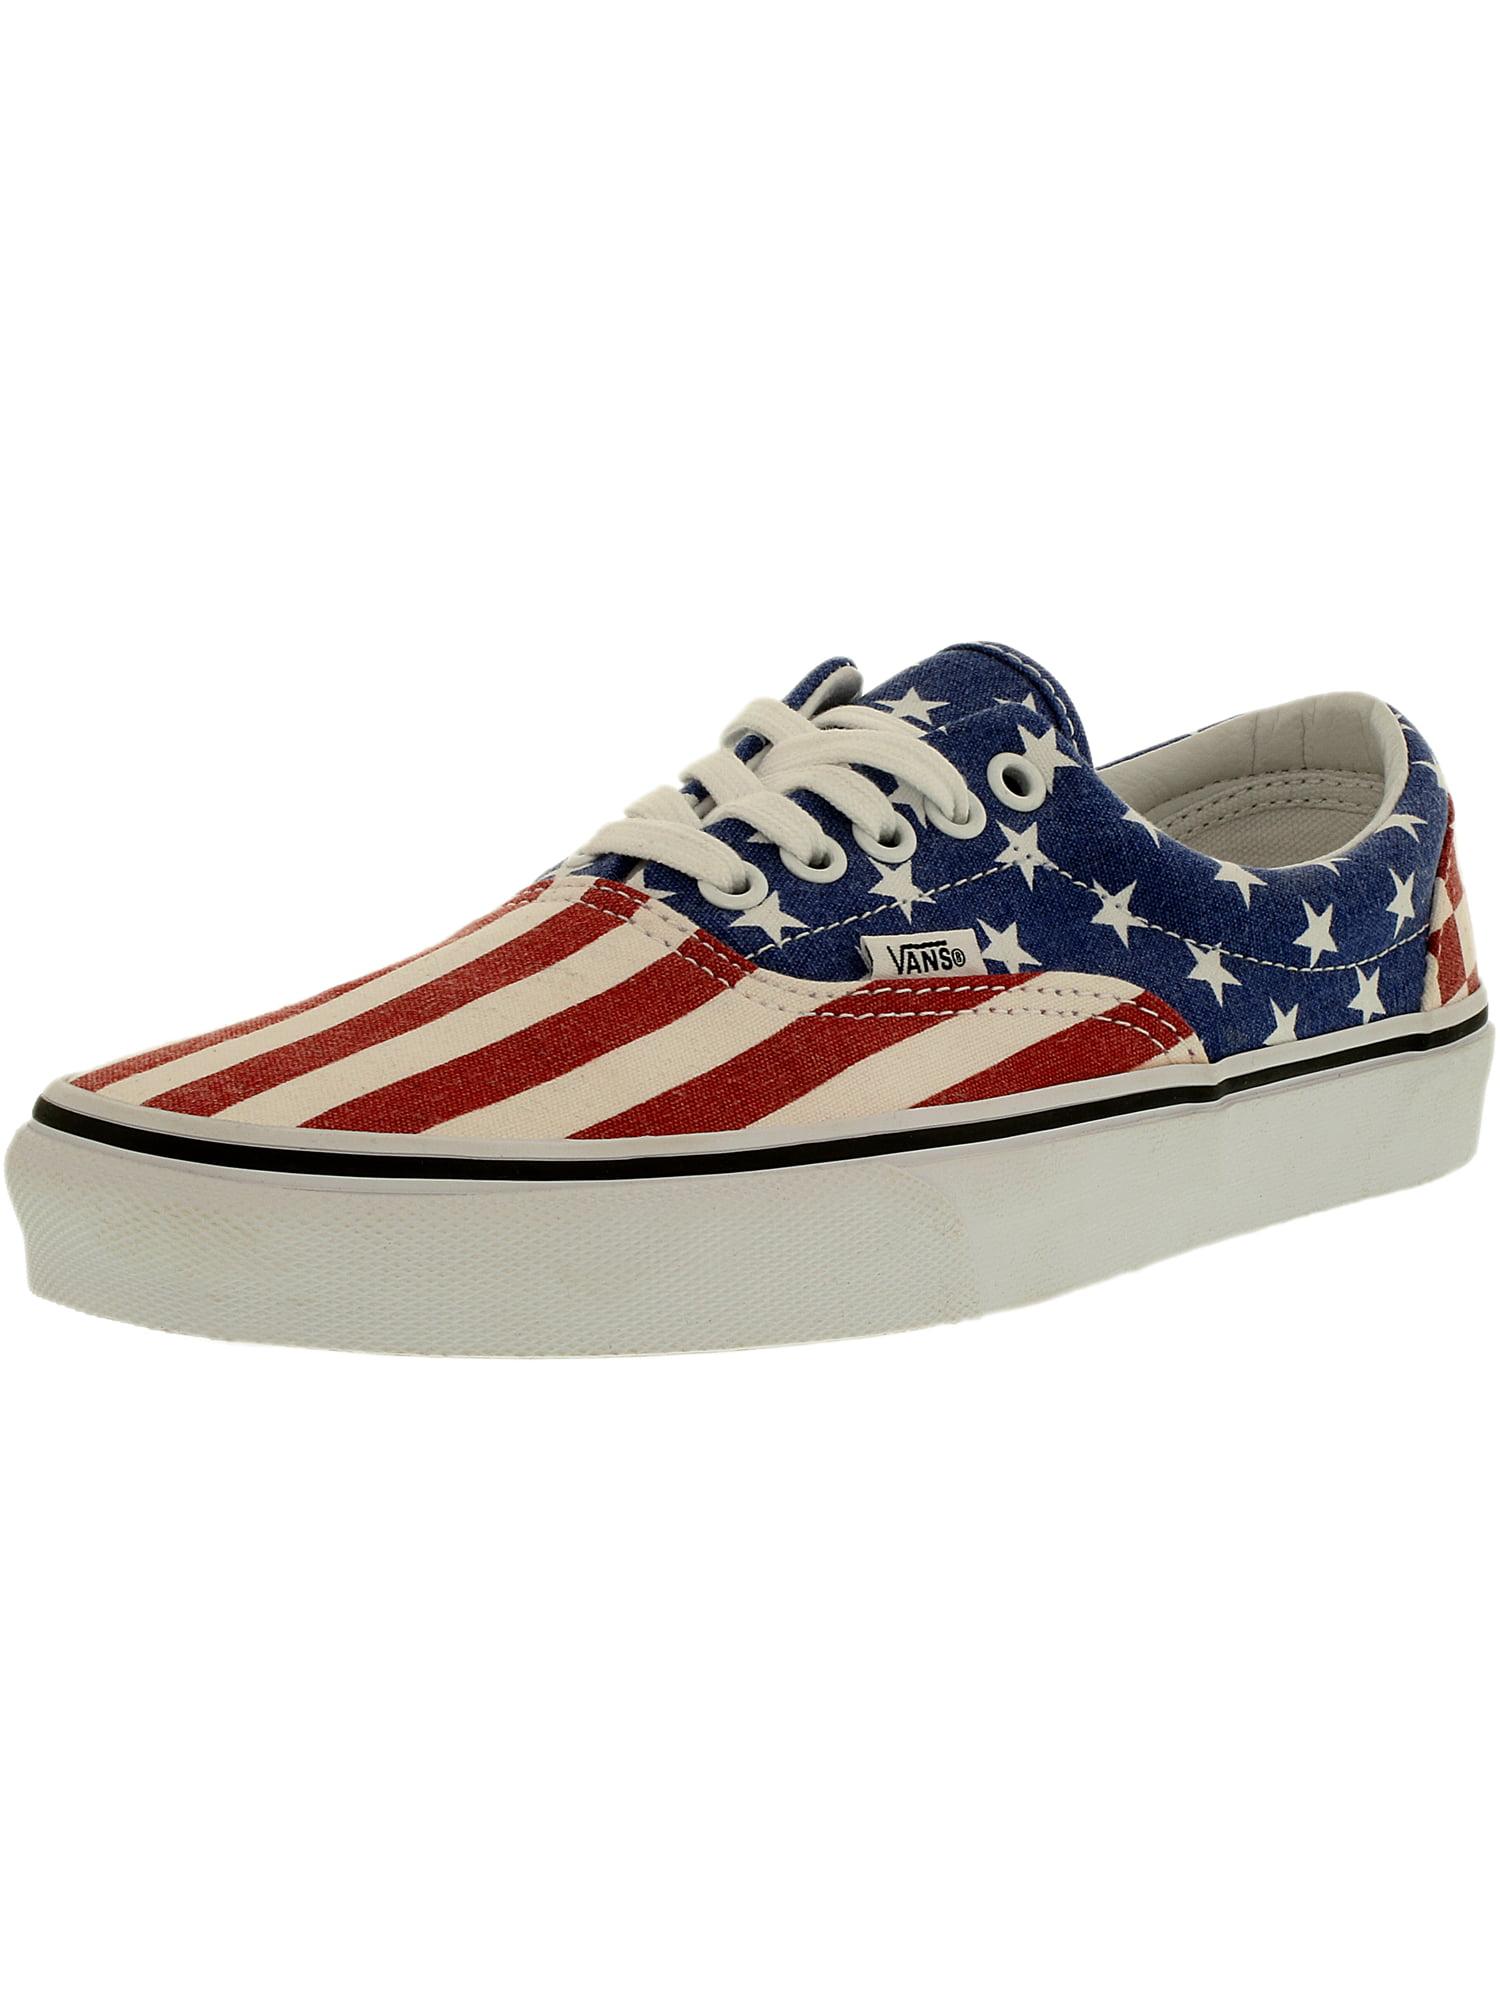 Vans Men's Era Stars/ Stripes Ankle-High Canvas Fashion Sneaker - 9M